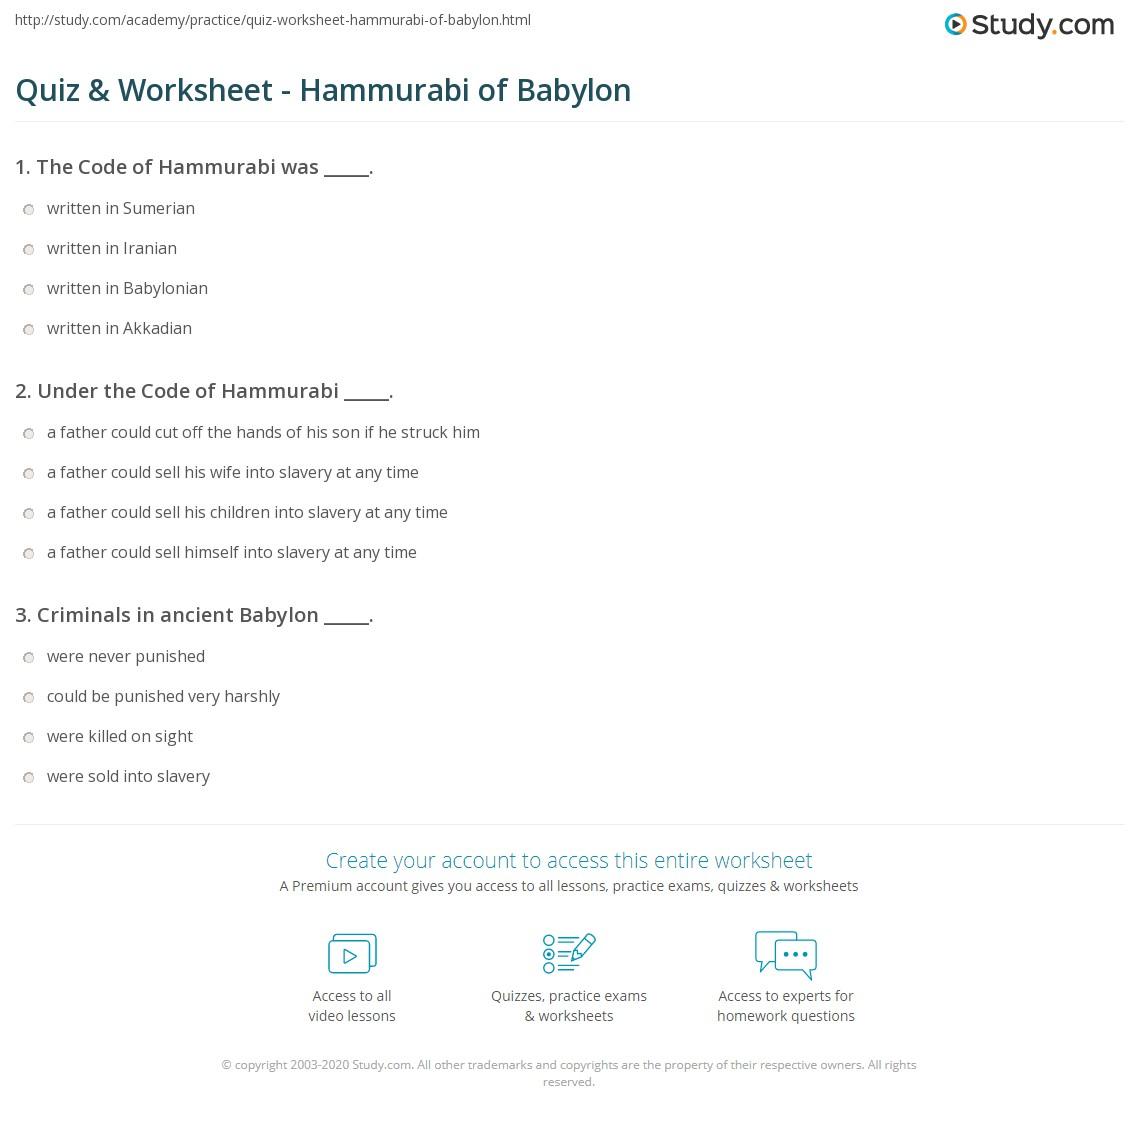 Hammurabi essay 3 pages, Coursework Writing Service